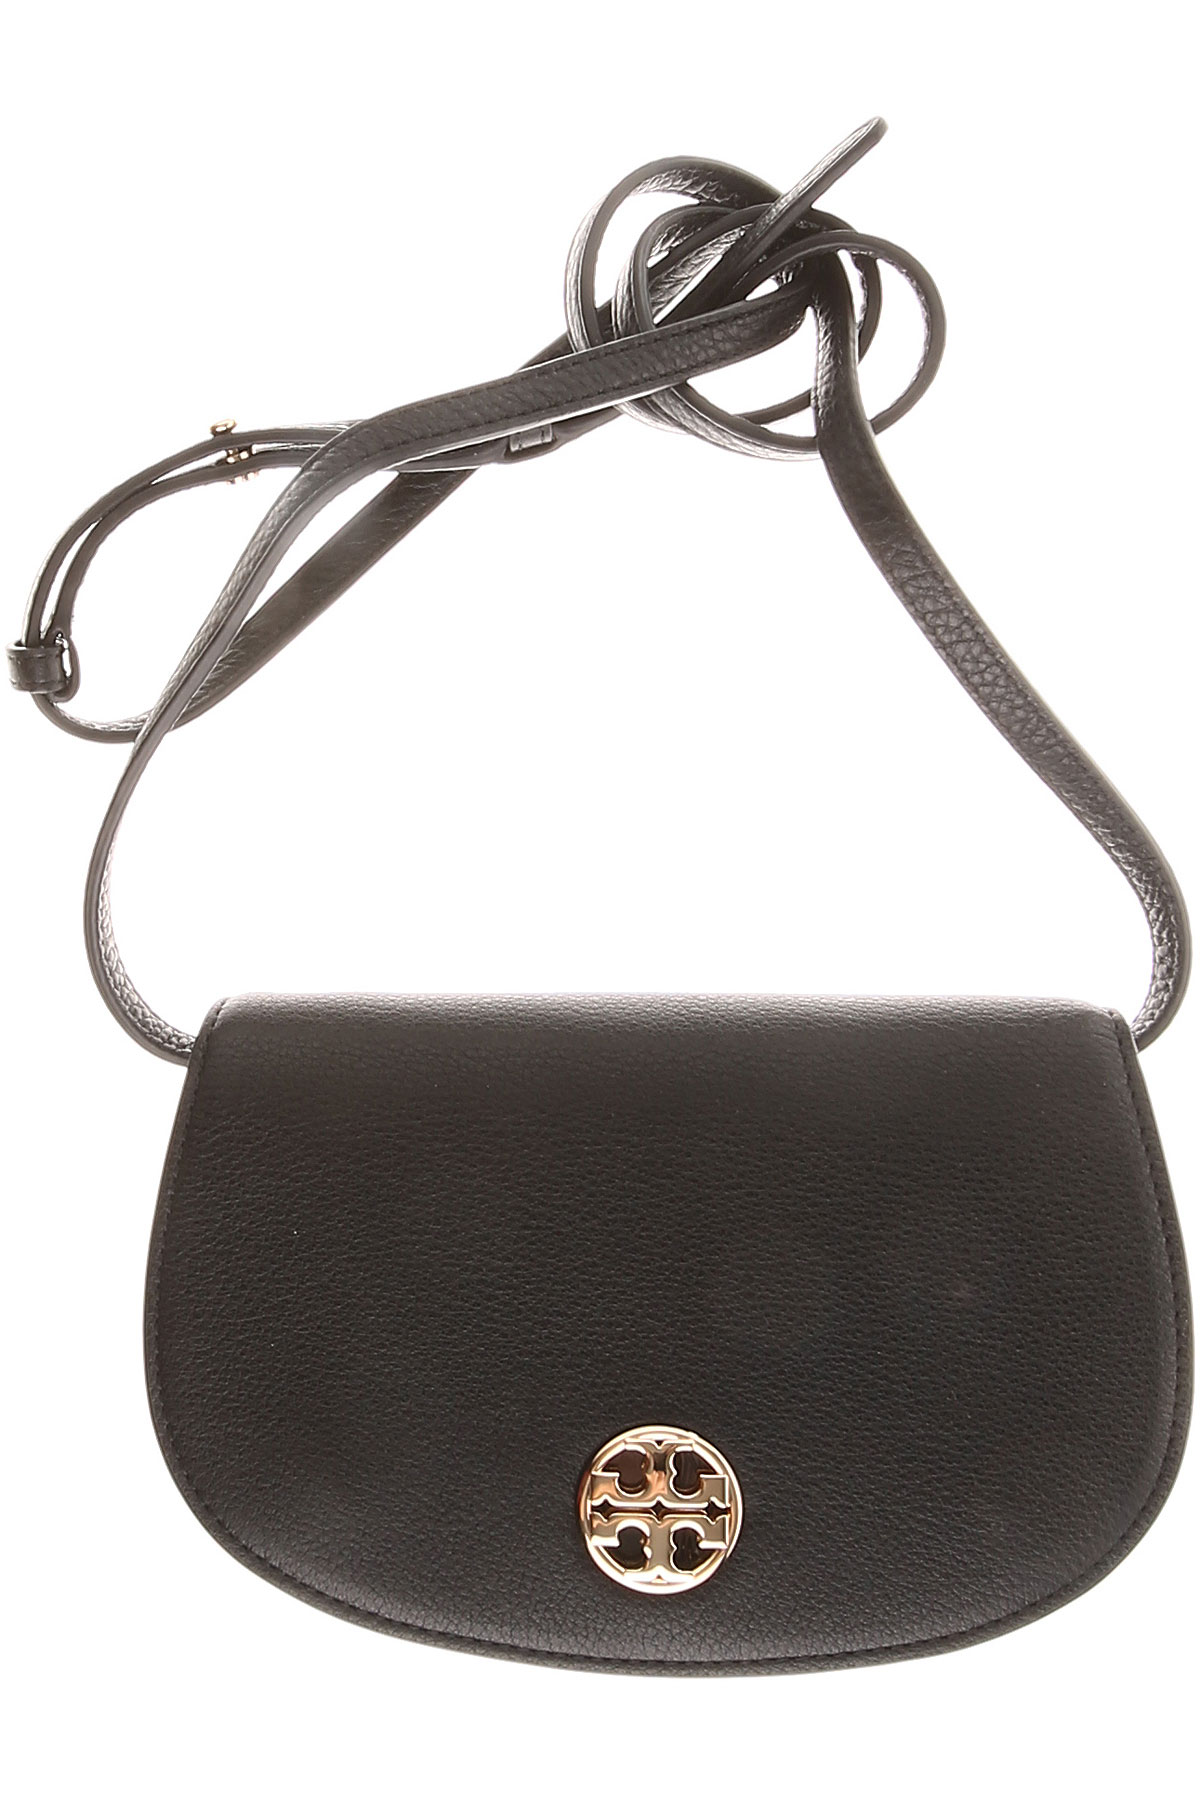 Tory Burch Shoulder Bag for Women On Sale, Black, Leather, 2017 USA-426657